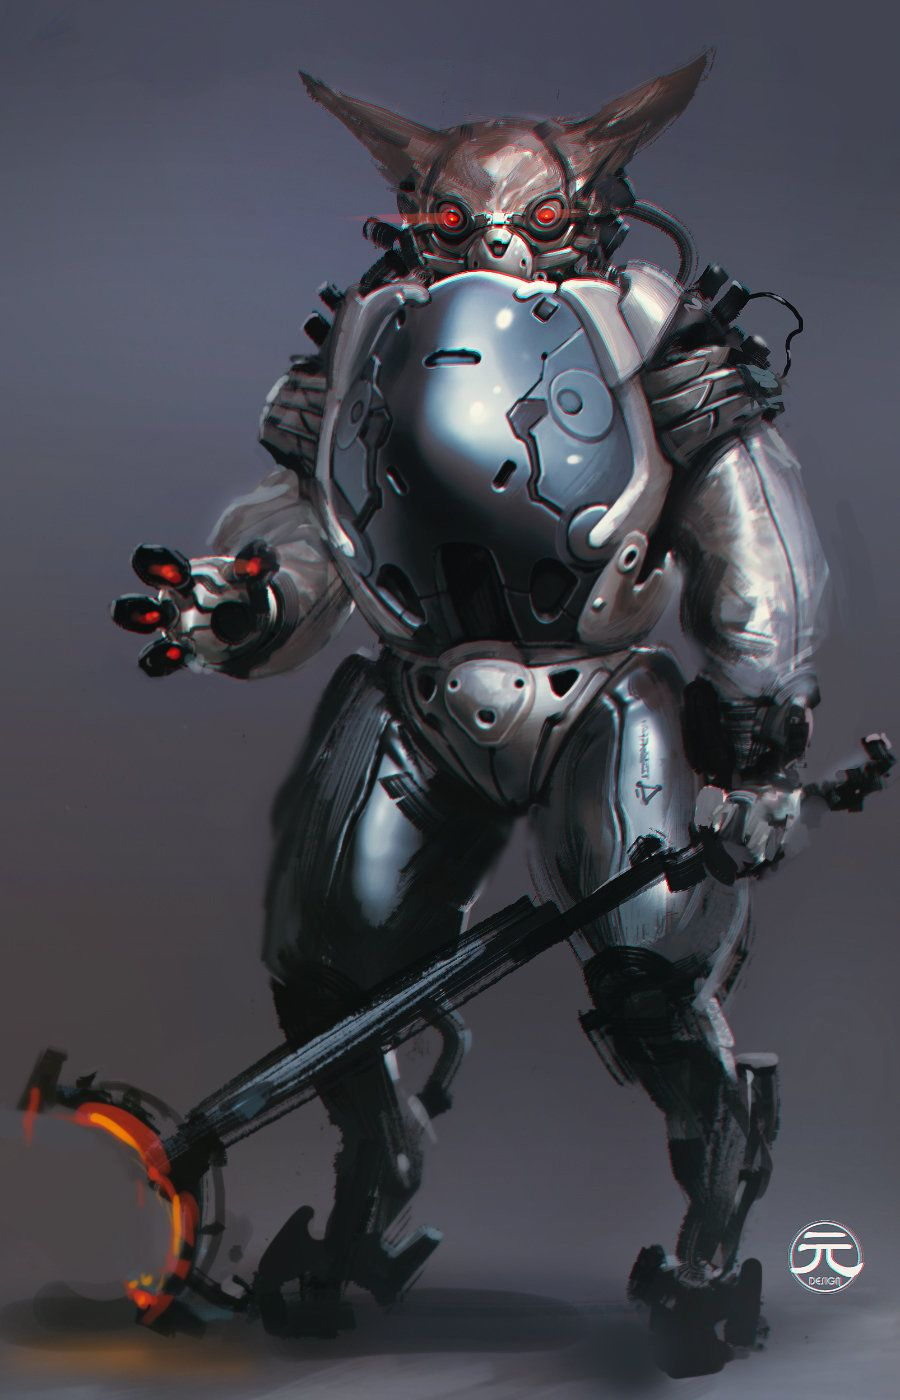 Space Rabbit, Yuan Cui on ArtStation at https://www.artstation.com/artwork/space-rabbit